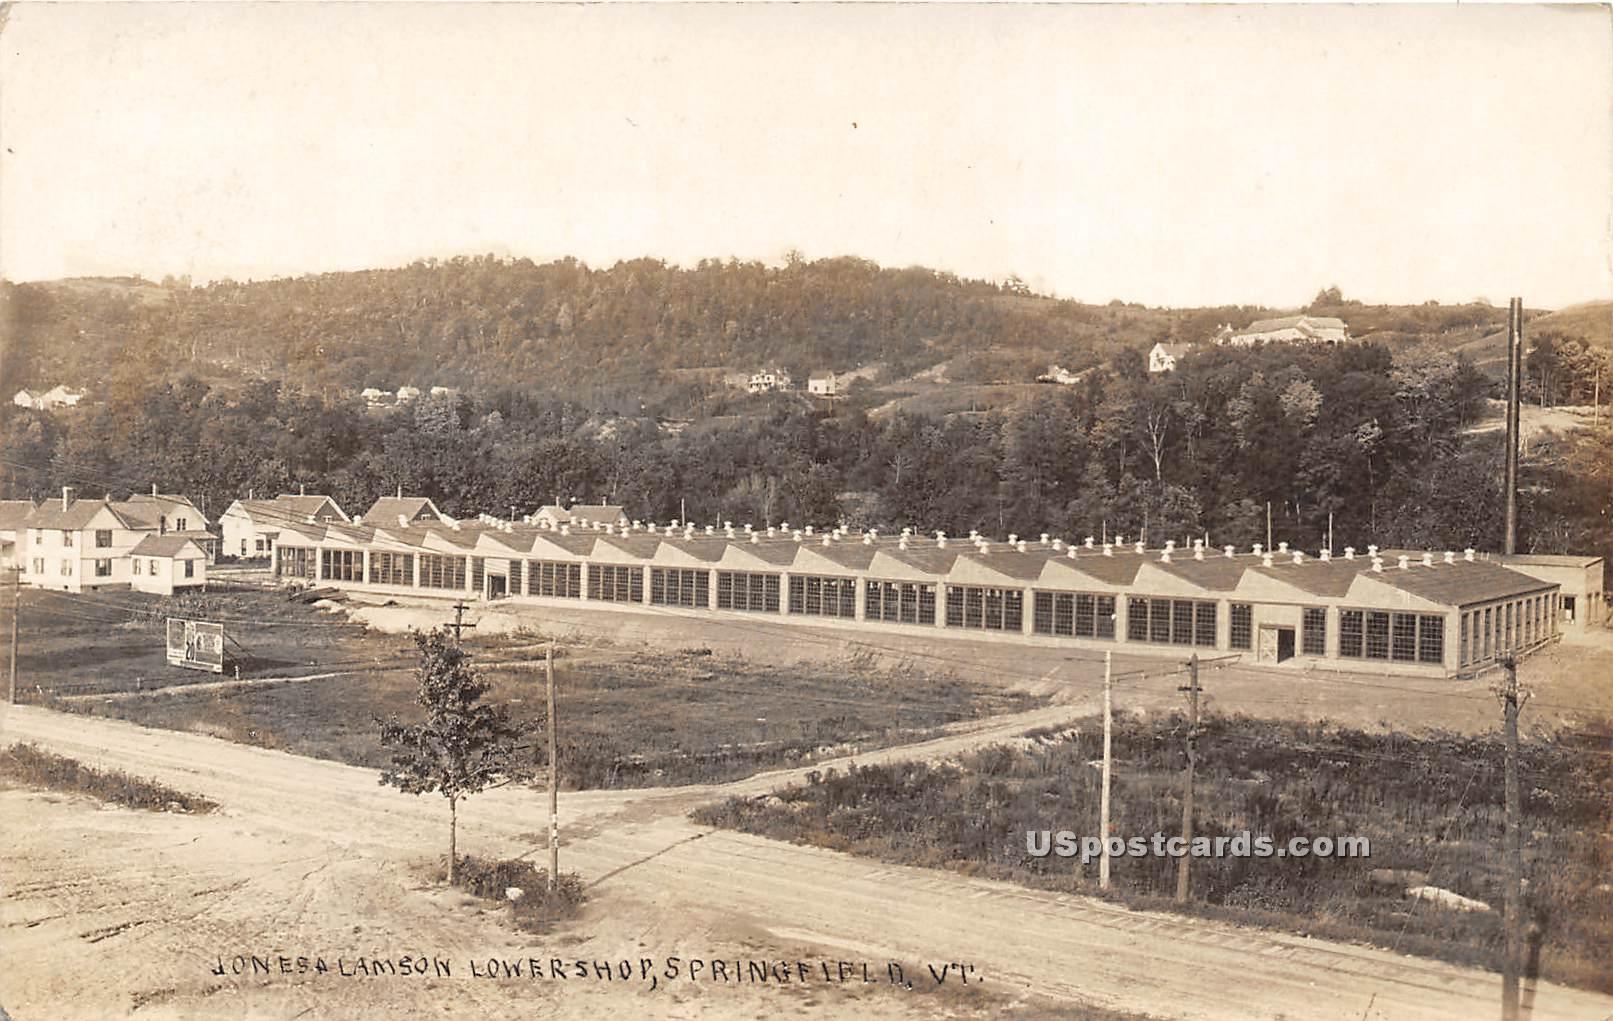 Jones A Lamson Lower Shop - Springfield, Vermont VT Postcard